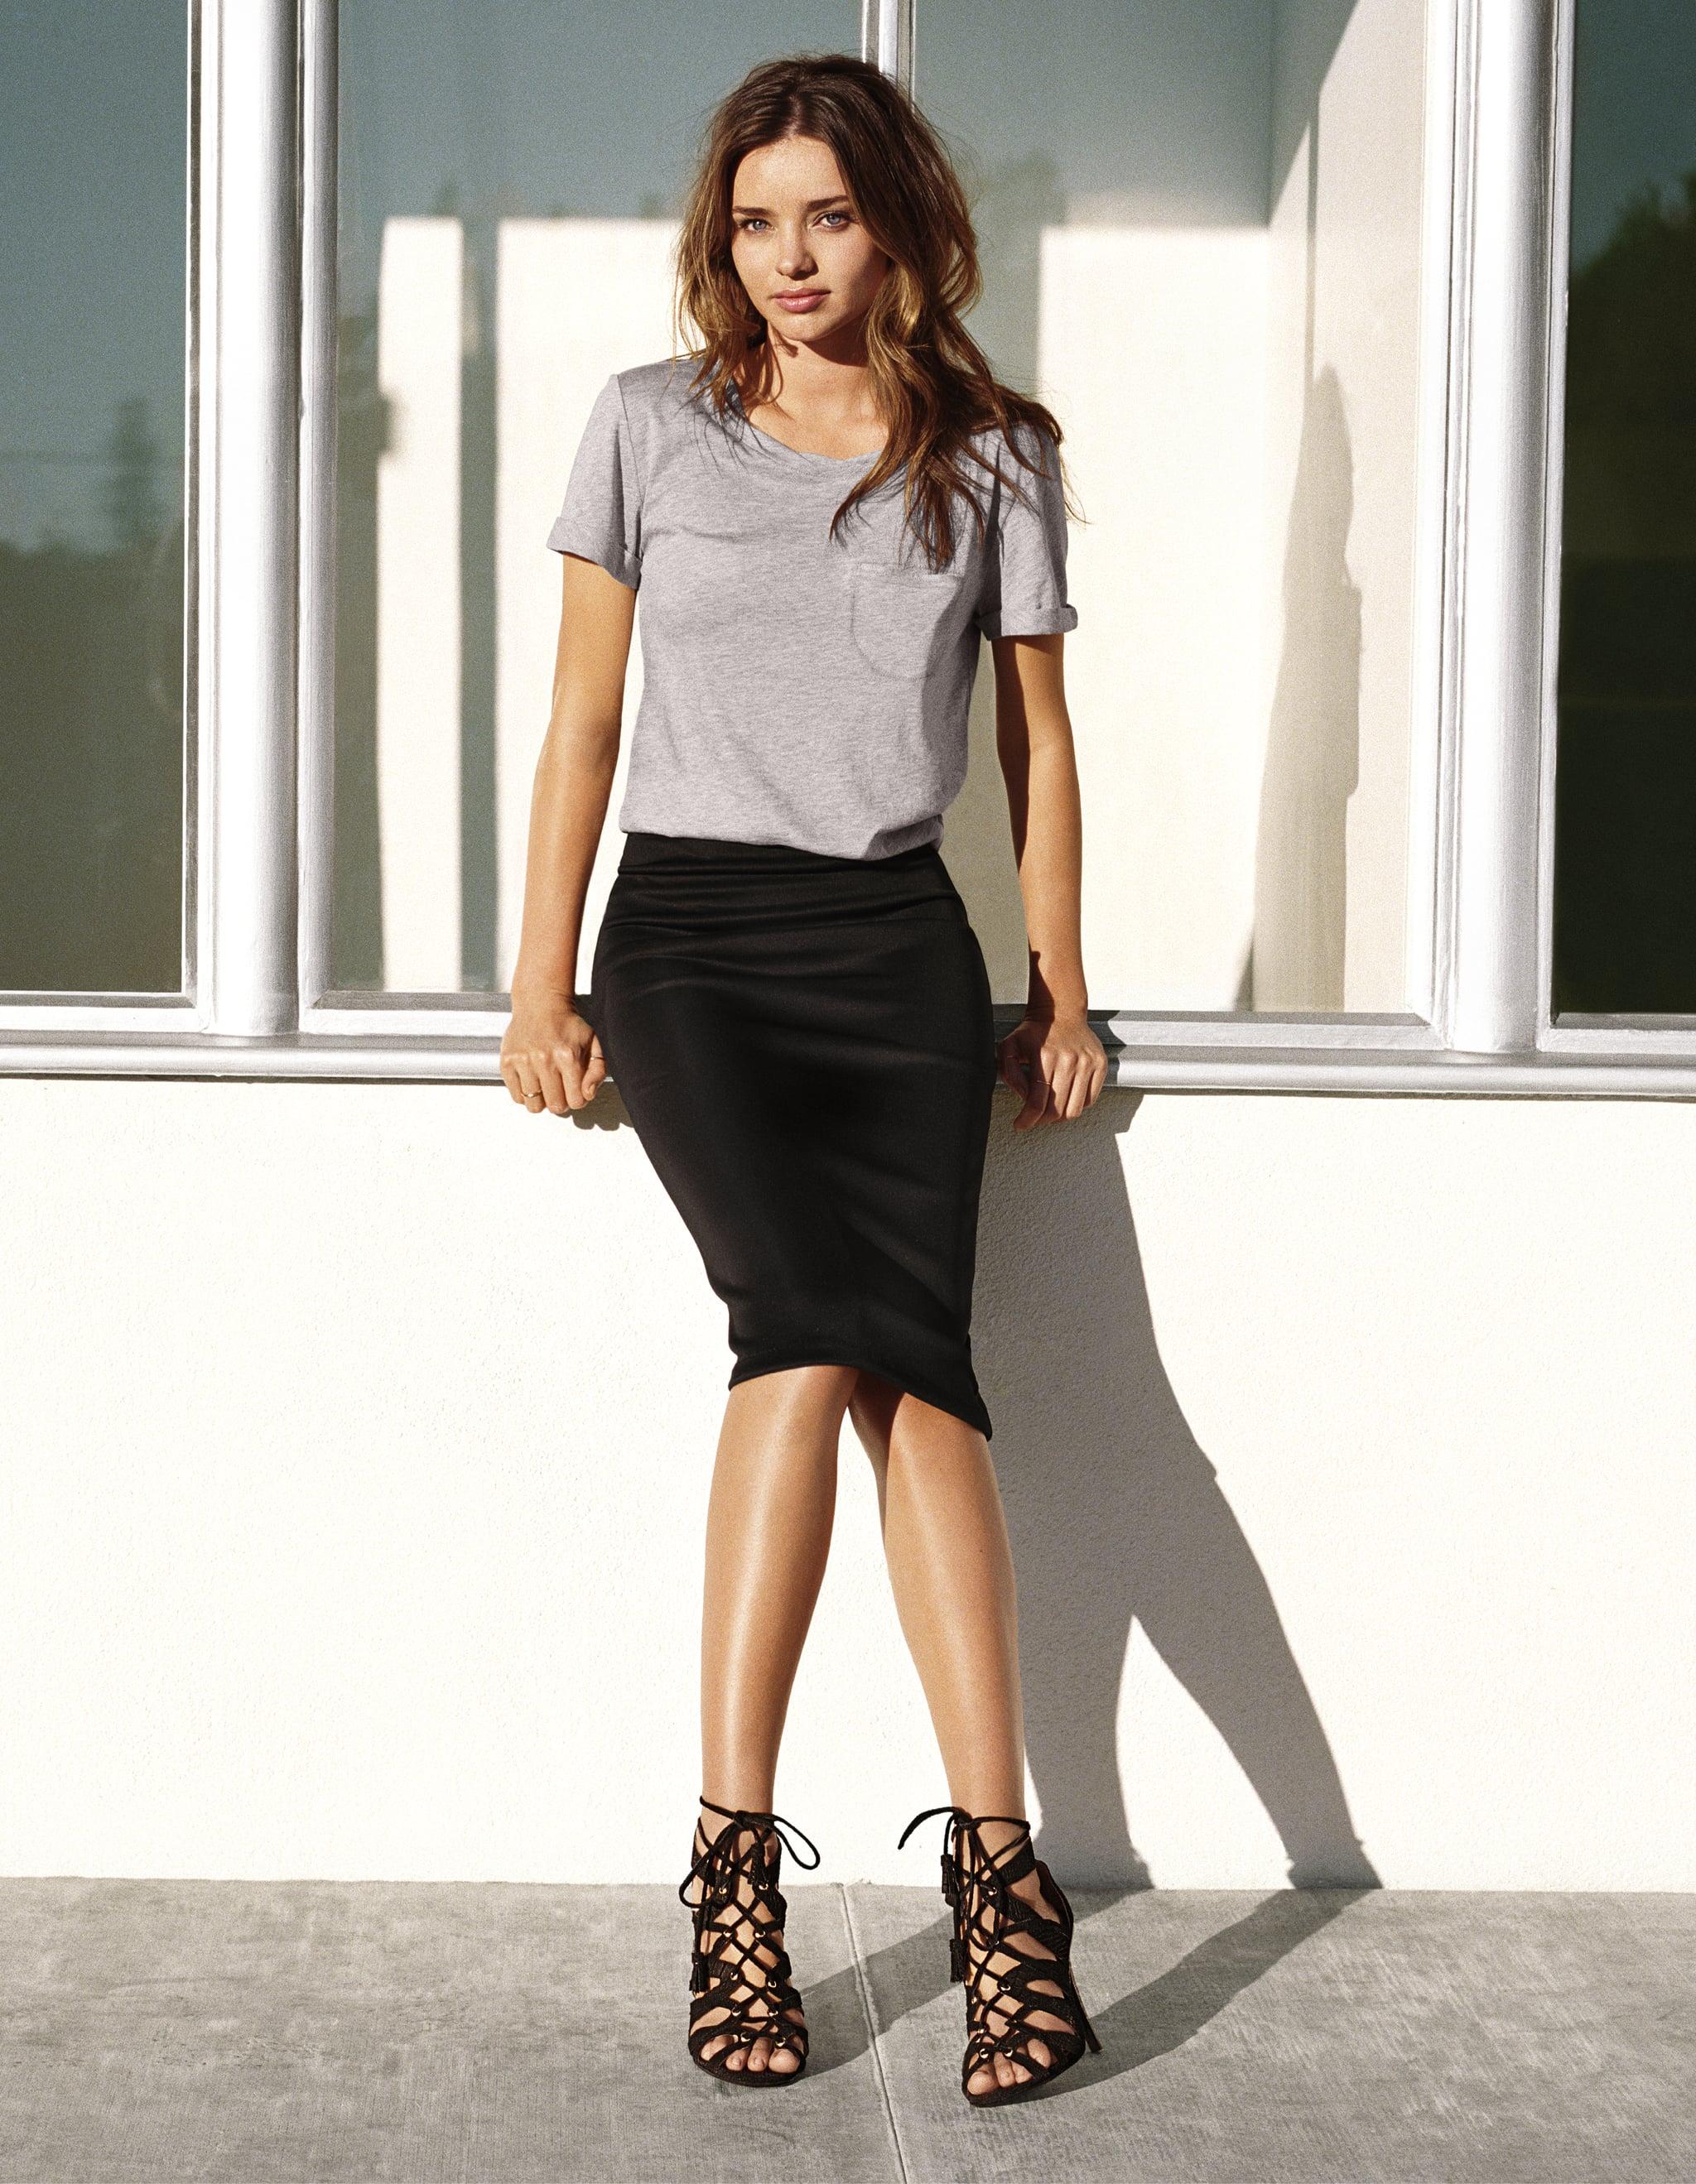 Miranda Kerr in H&M Spring 2014 Campaign